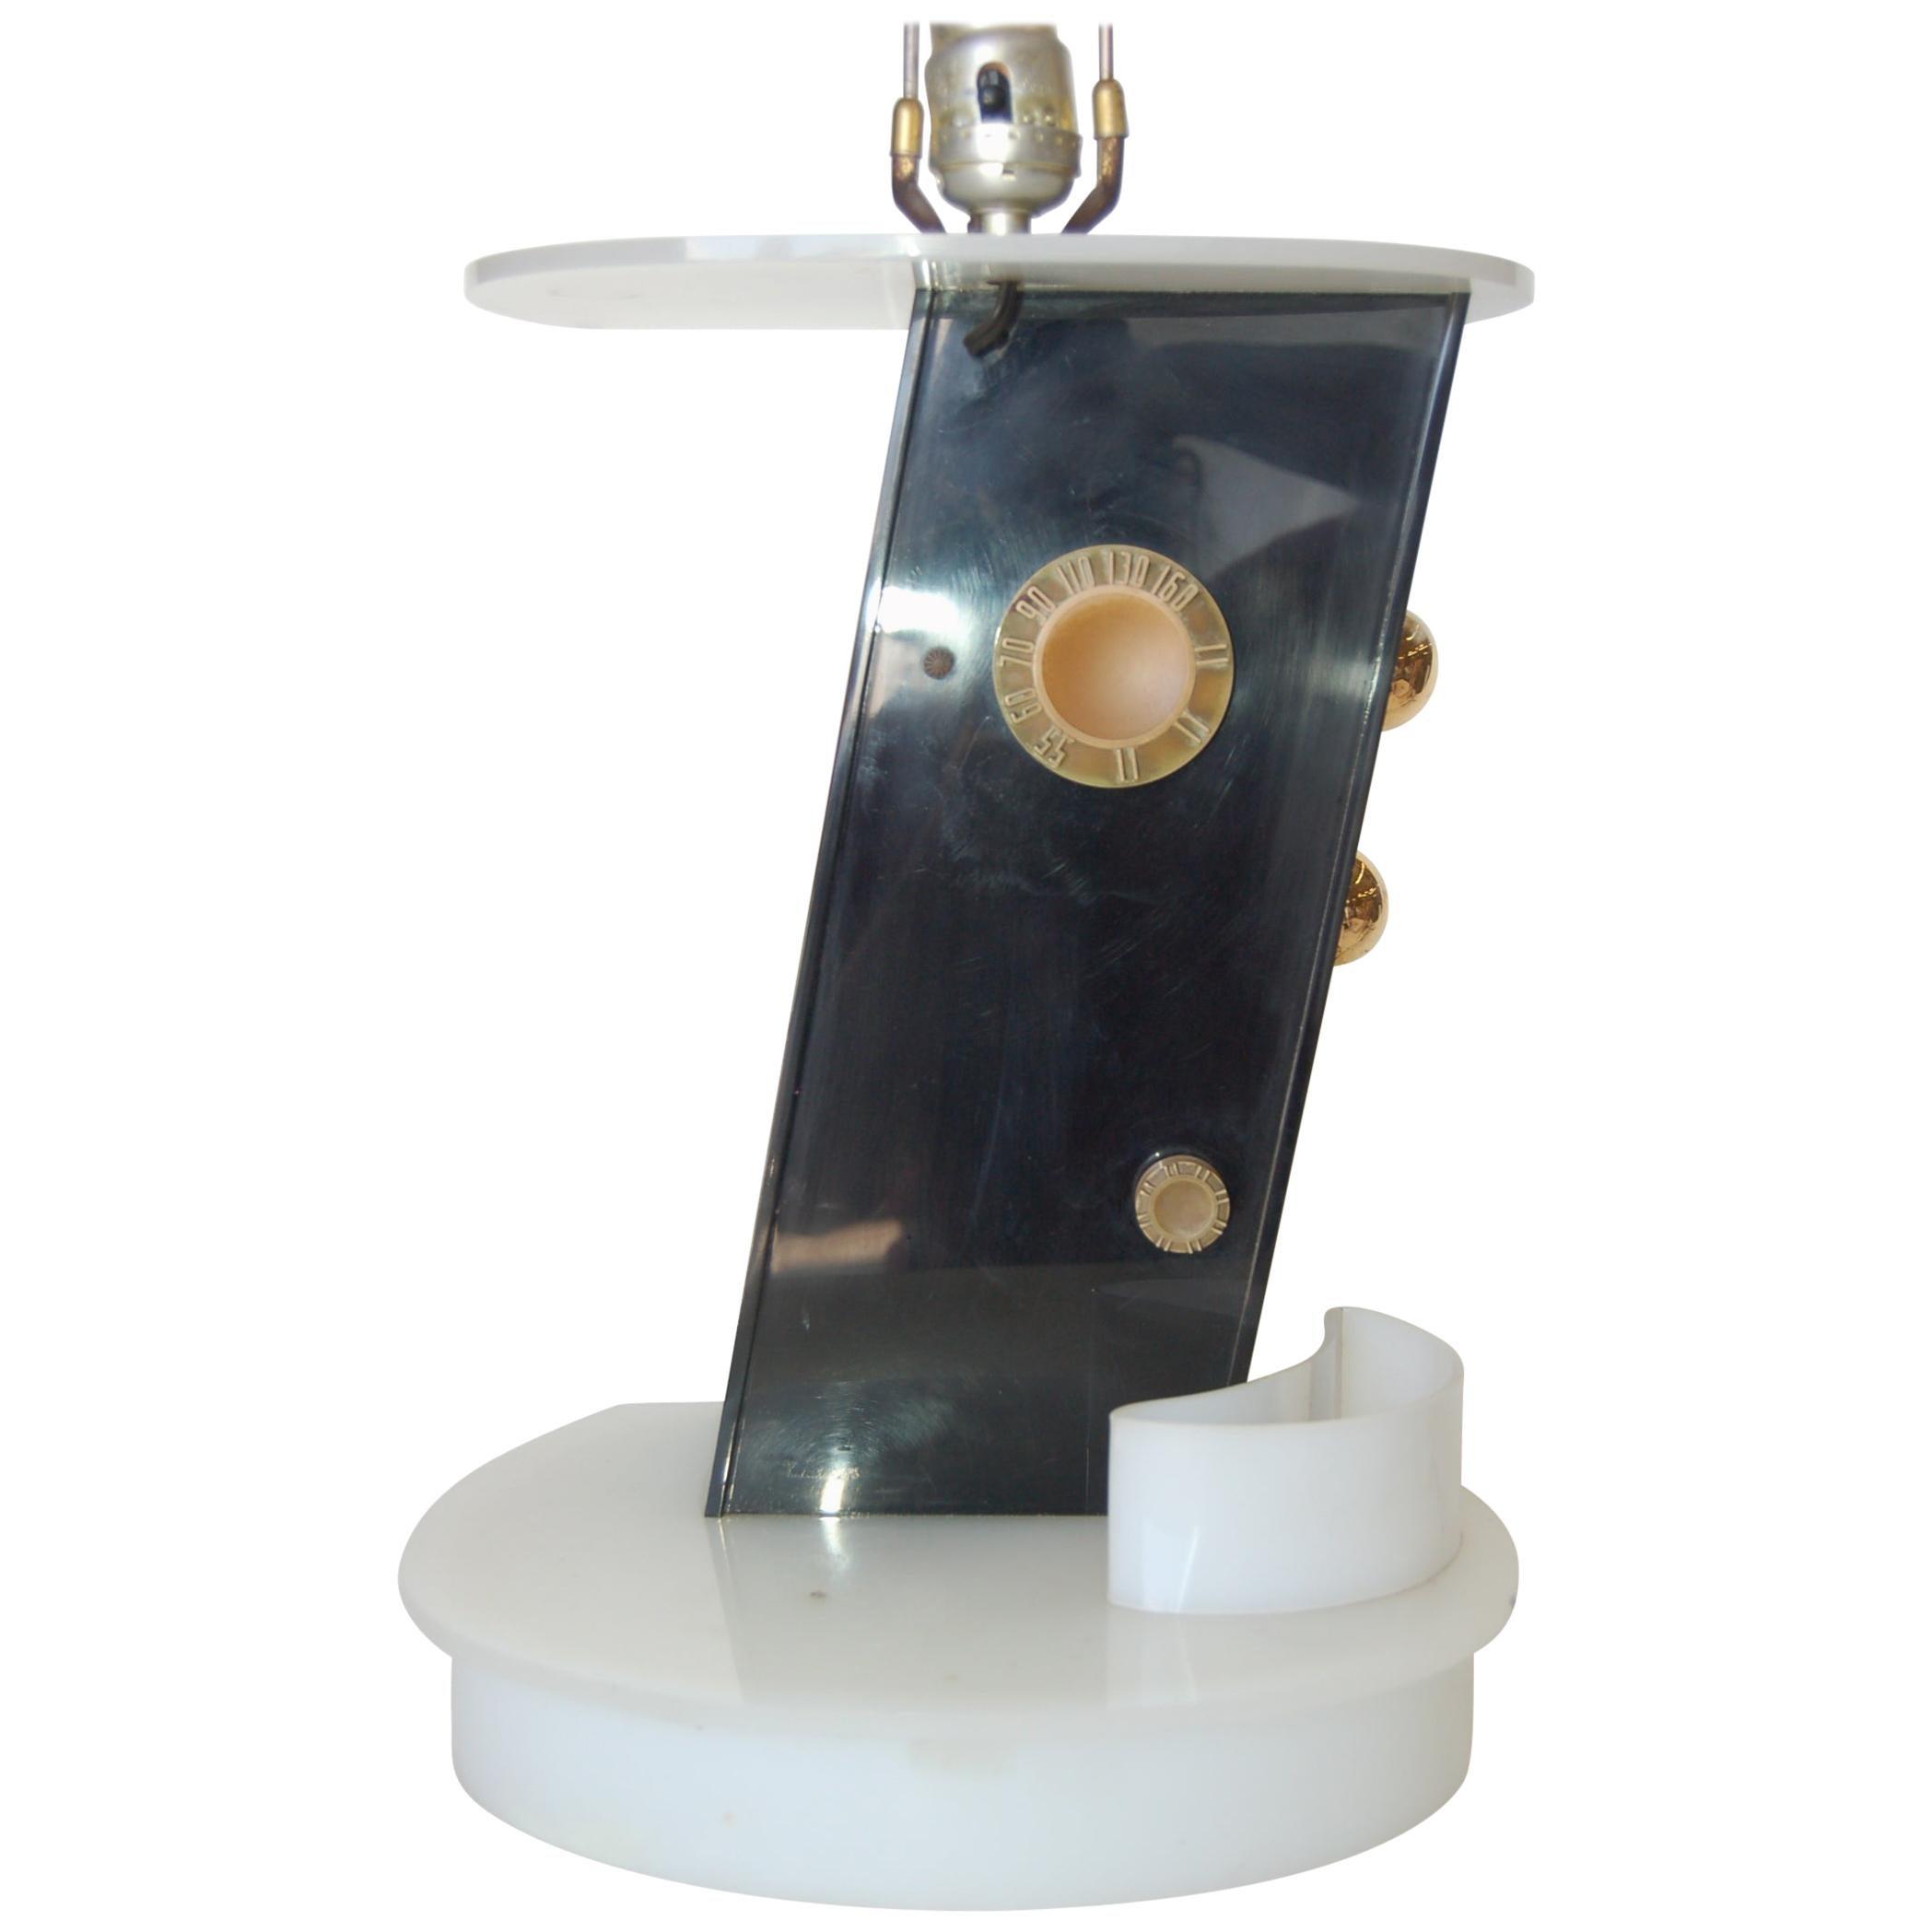 Rare Midcentury Lucite Radio Table Lamp by Moss Lighting